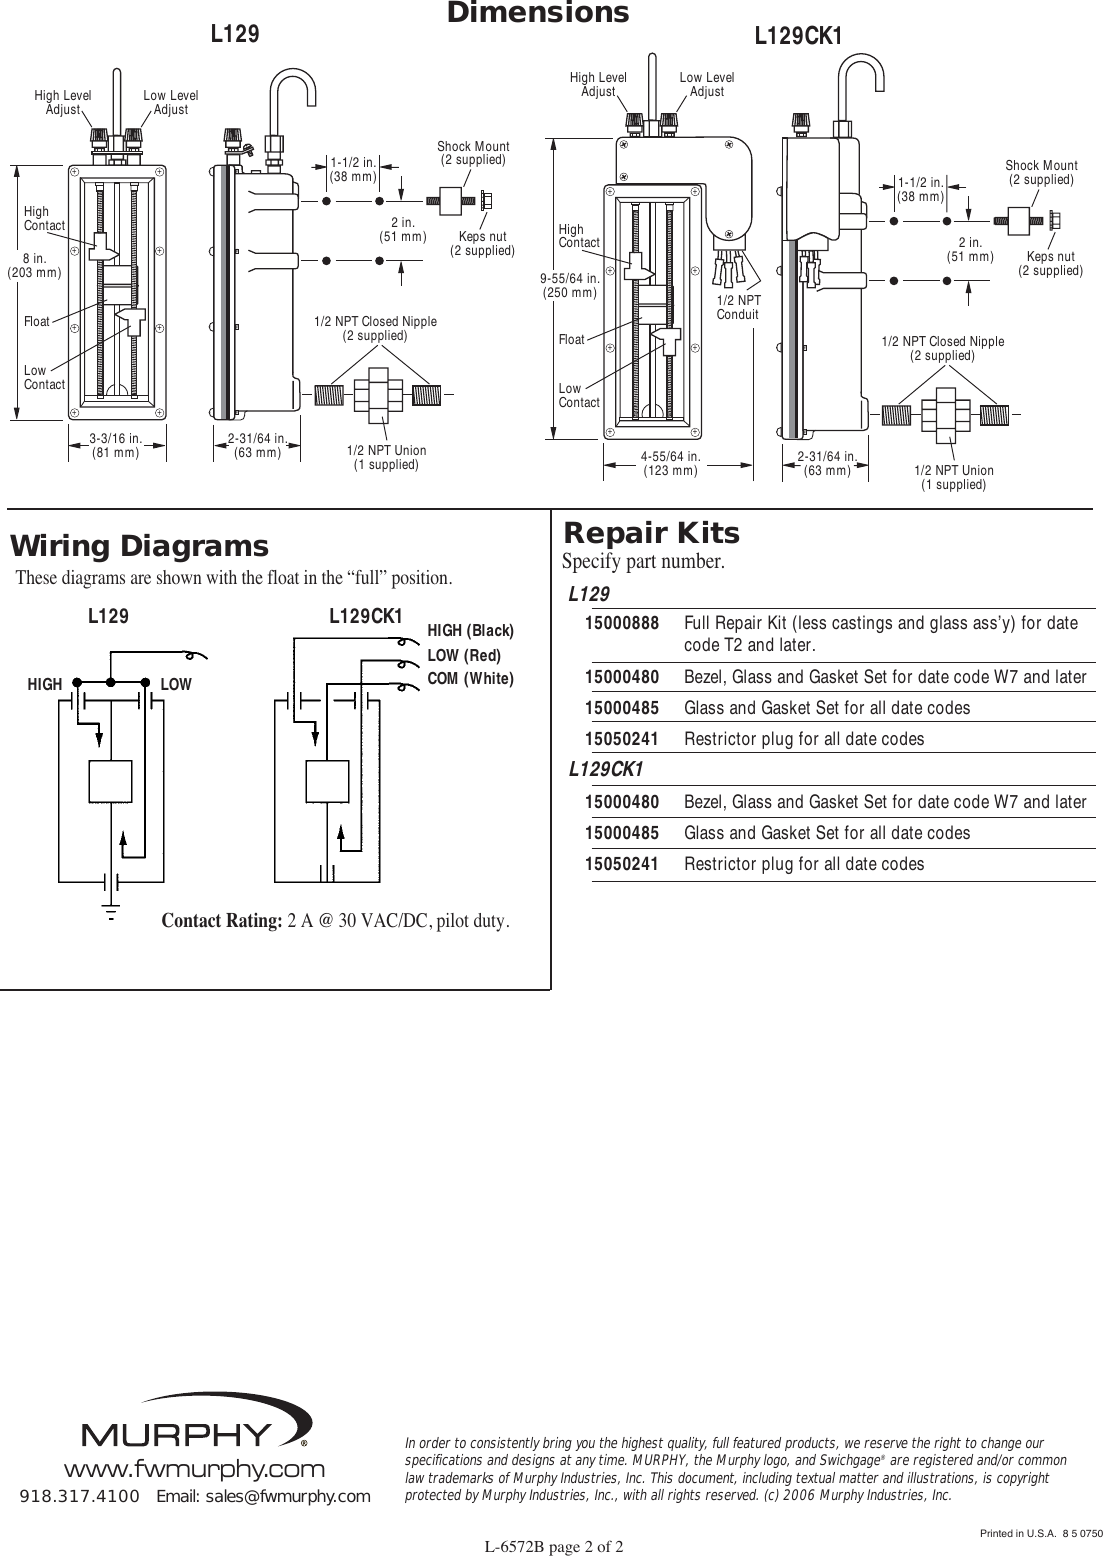 wiring-diagram-murphy-swichgage